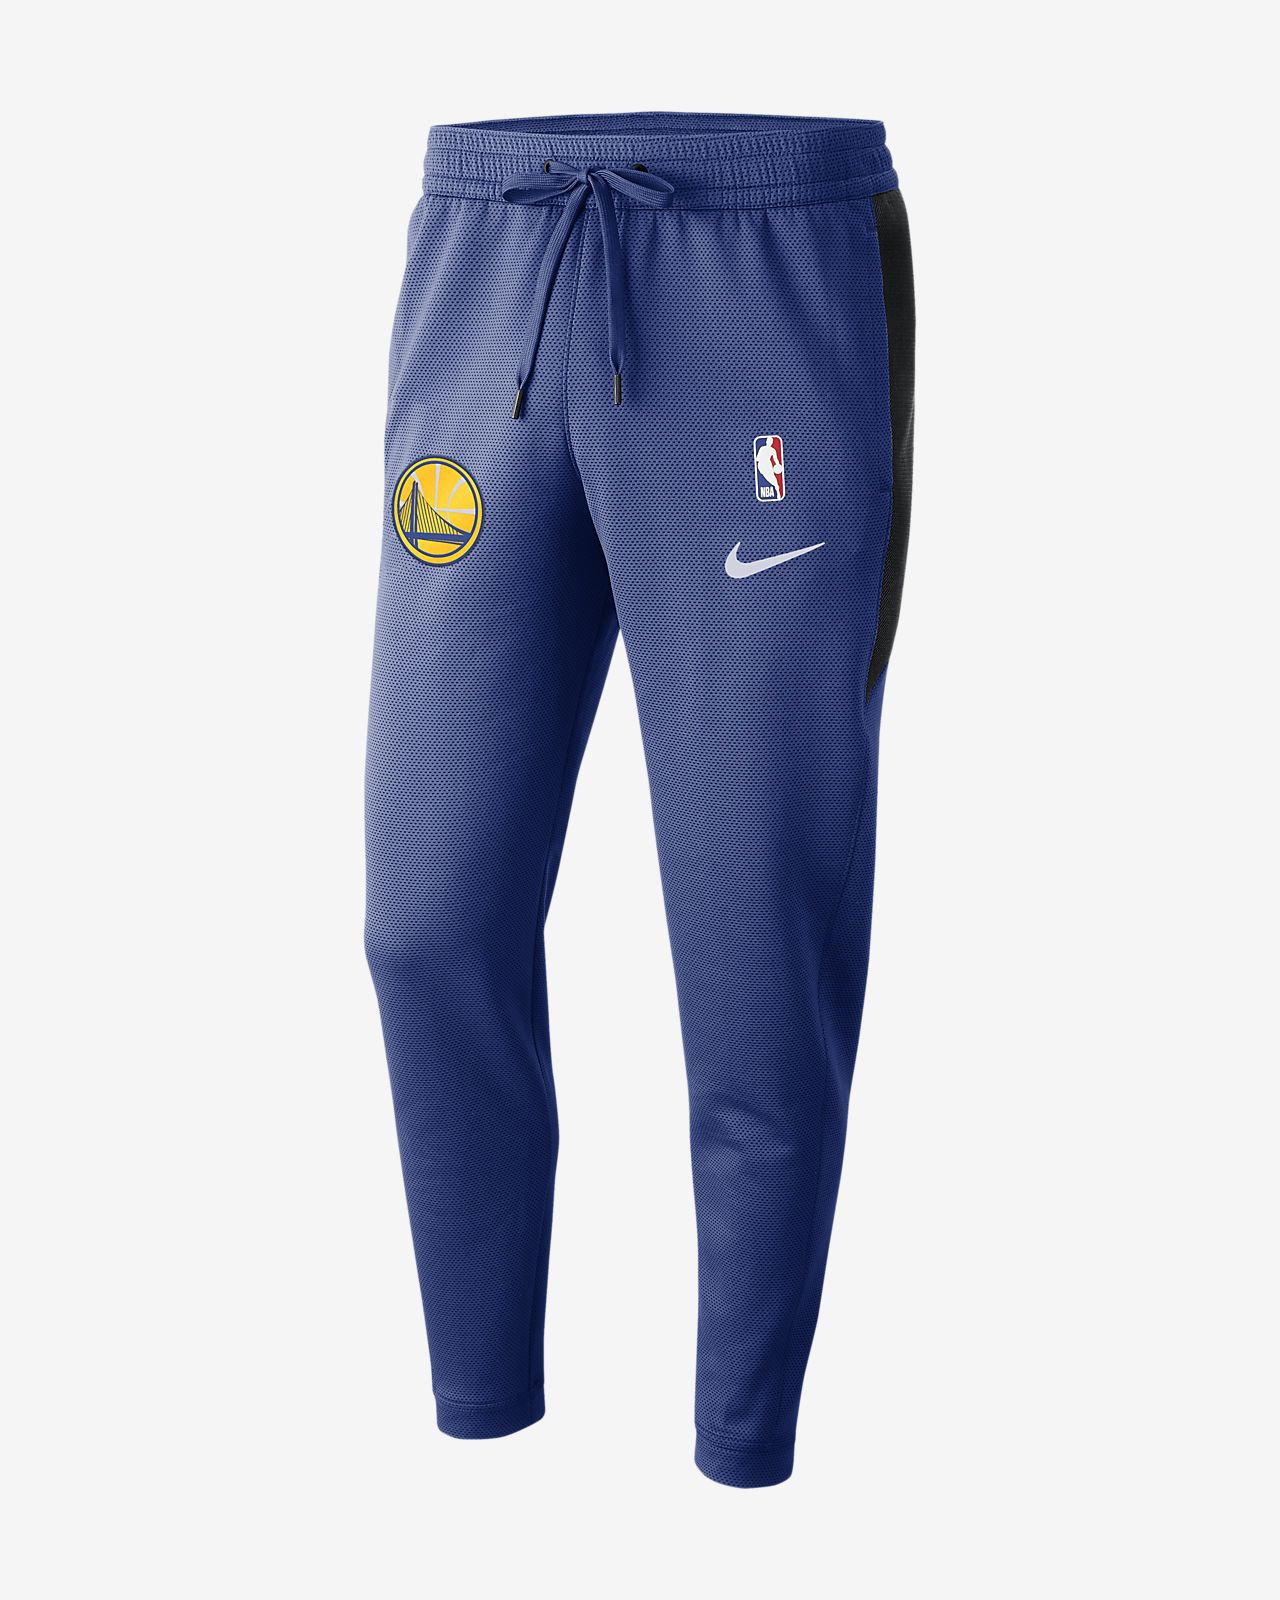 Pánské kalhoty NBA Golden State Warriors Nike Therma Flex Showtime